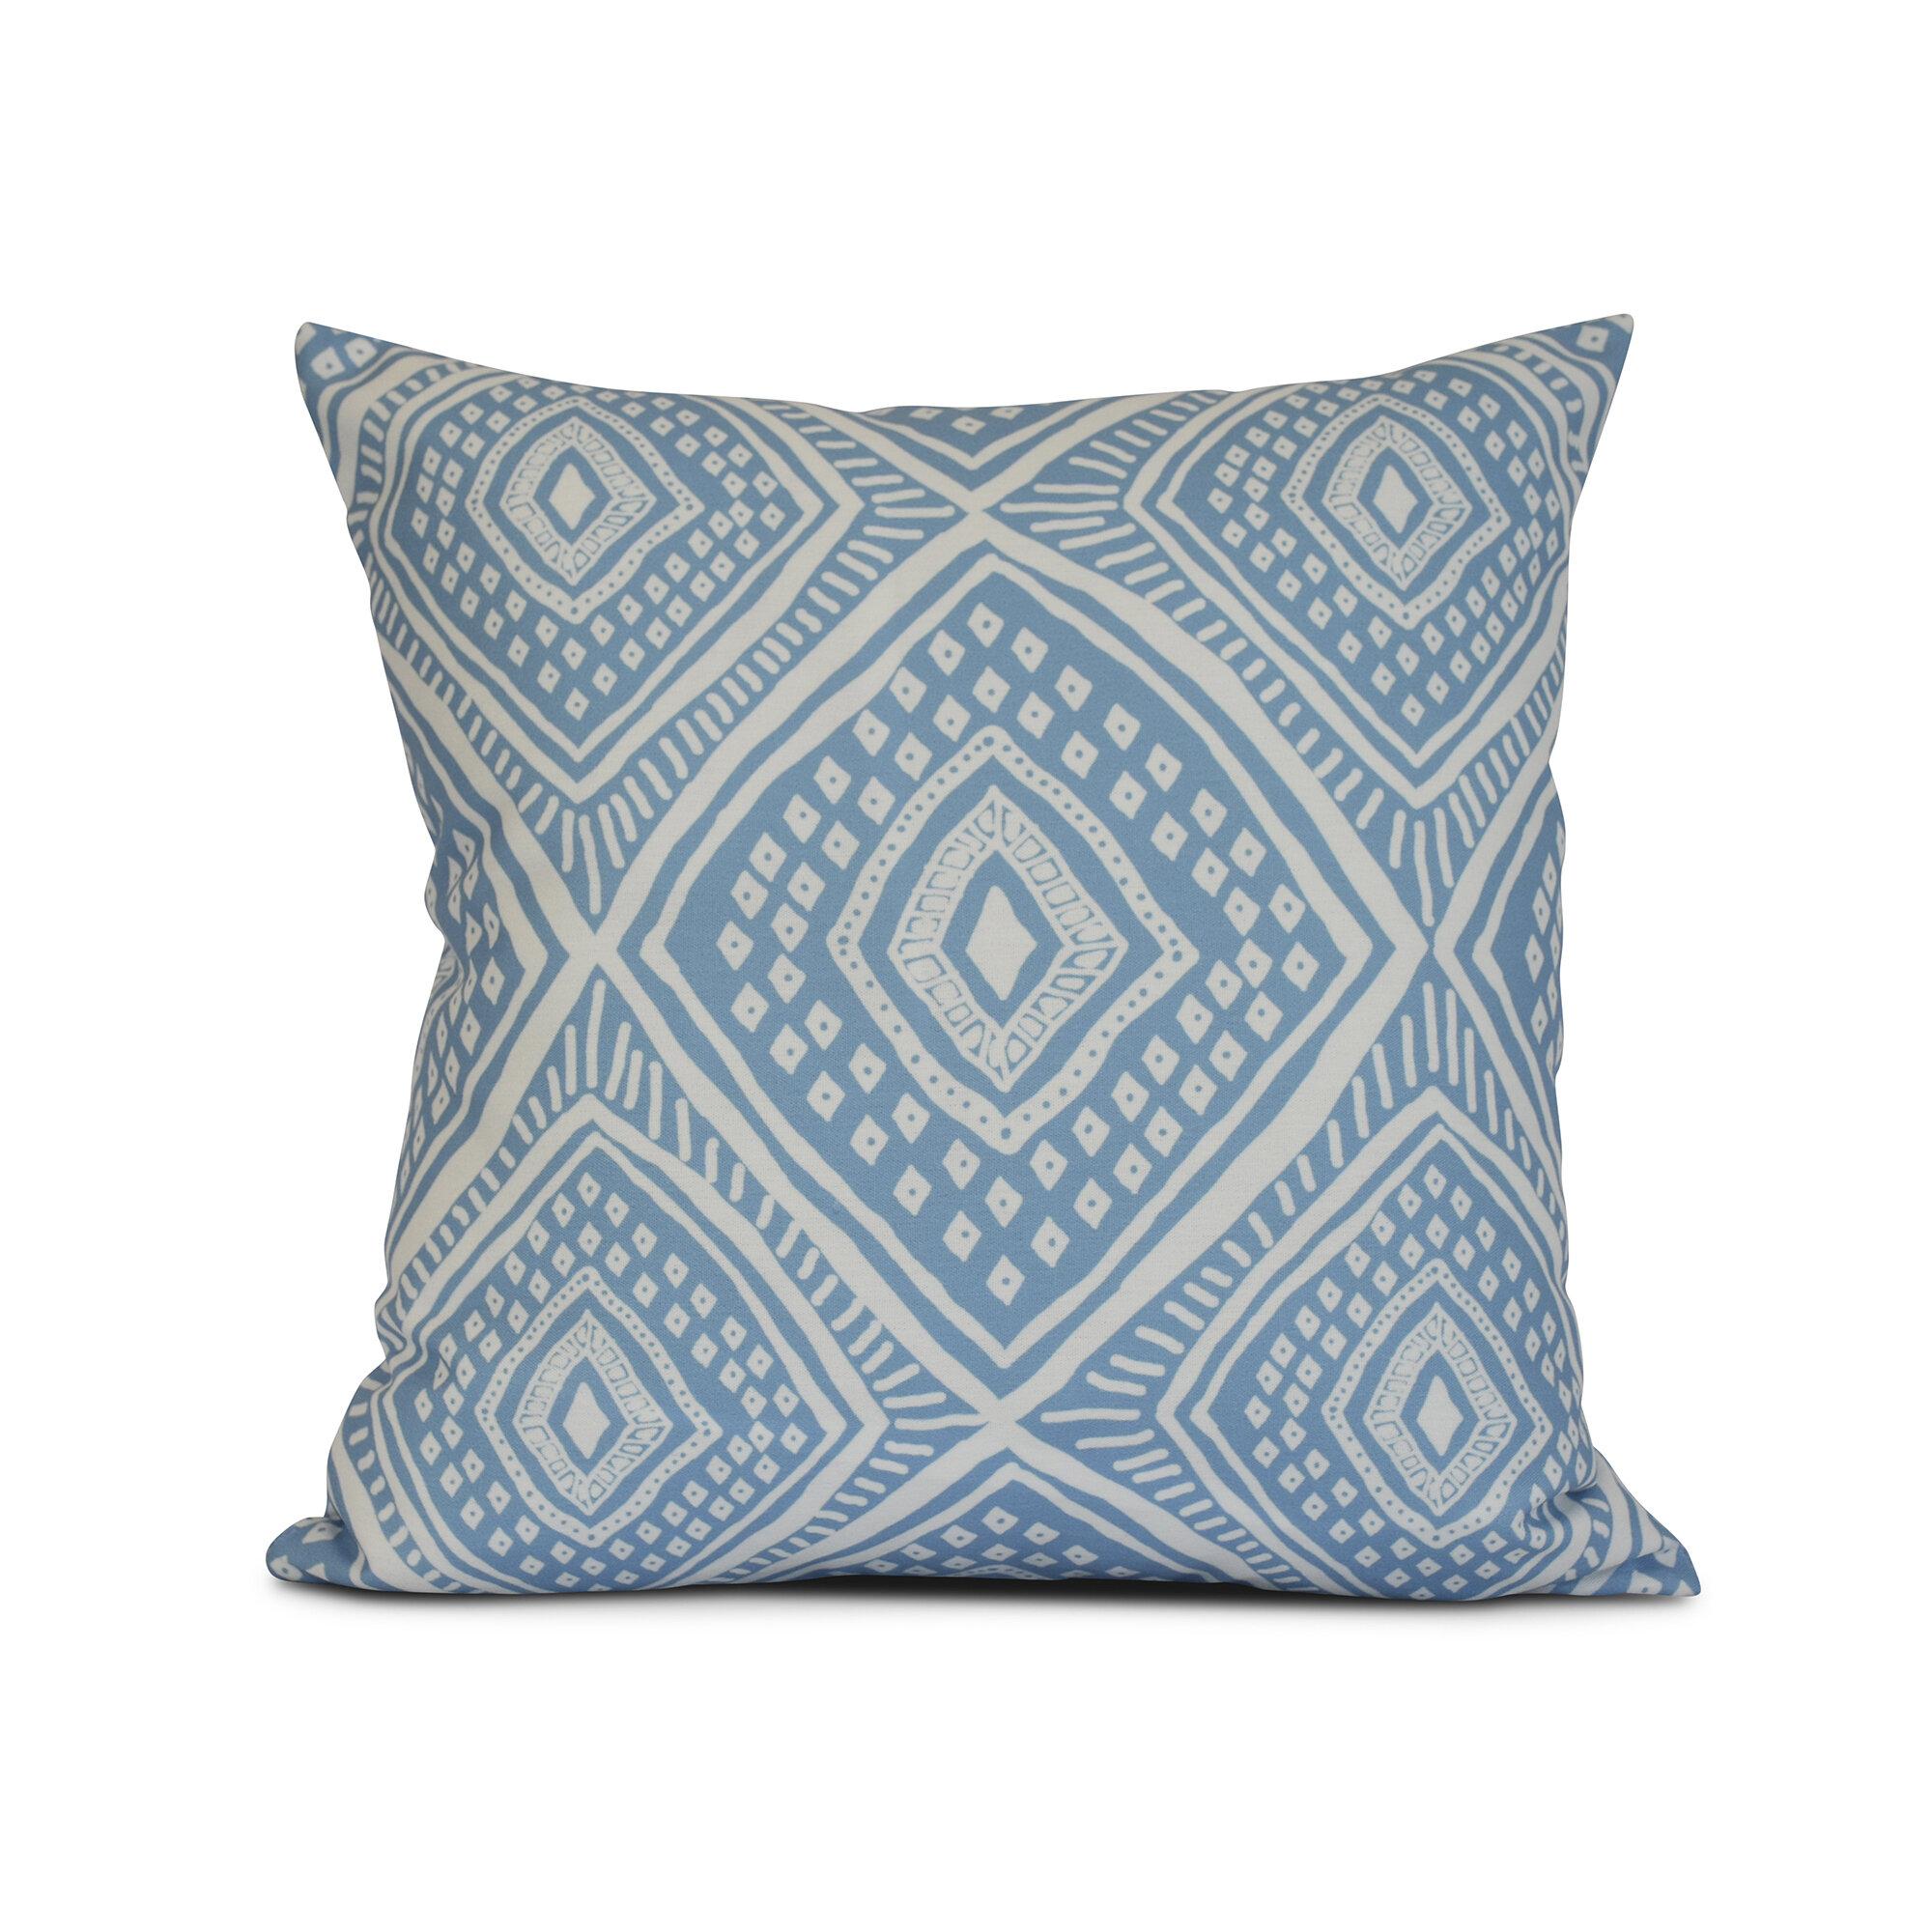 Adler Square Outdoor Throw Pillow Reviews Allmodern